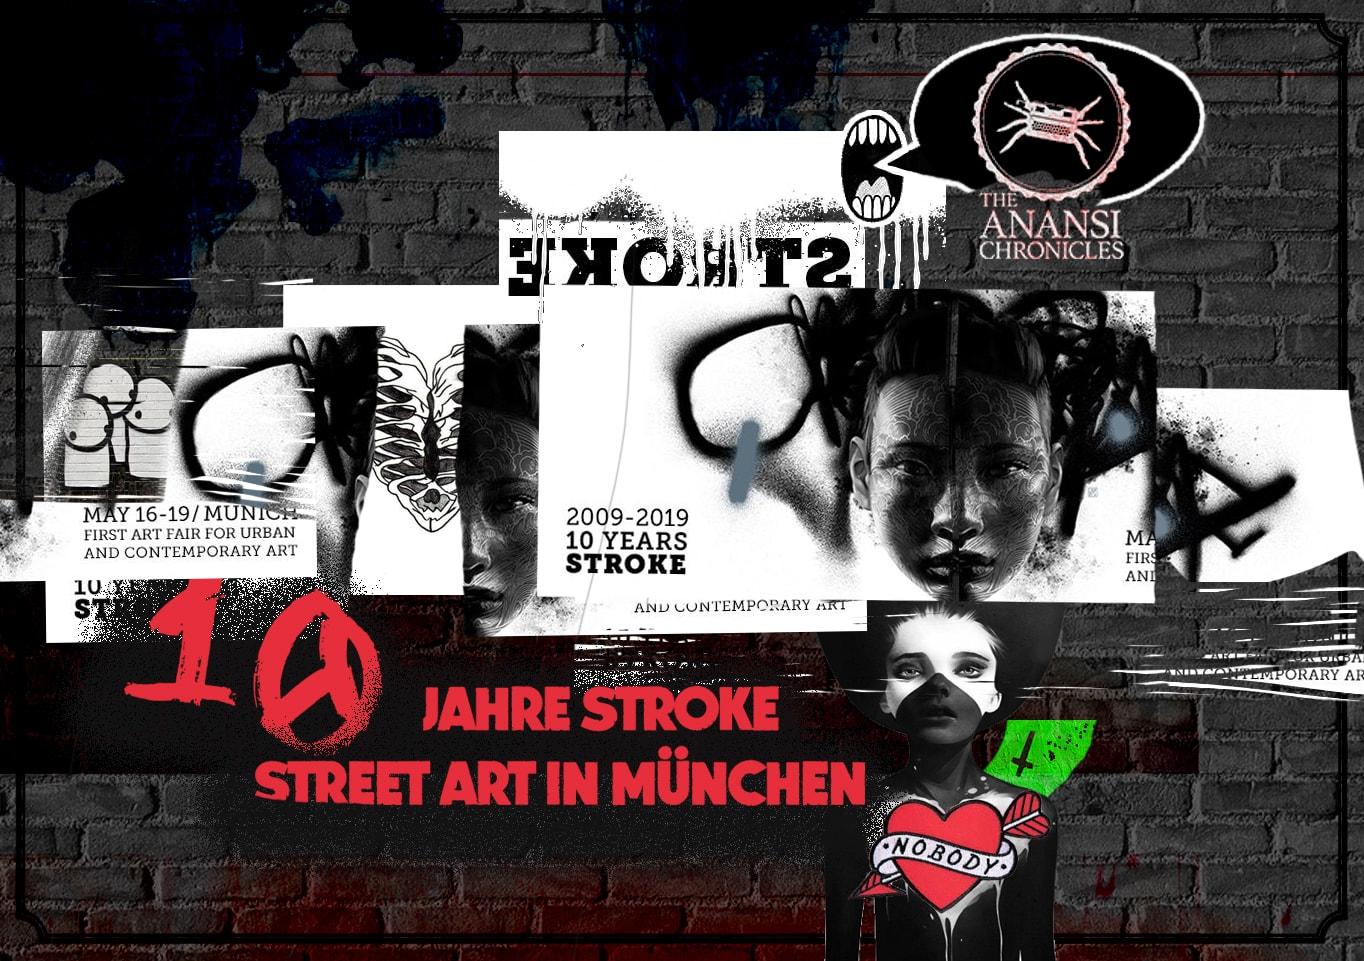 10 Jahre Stroke in München – urban and contemporary art